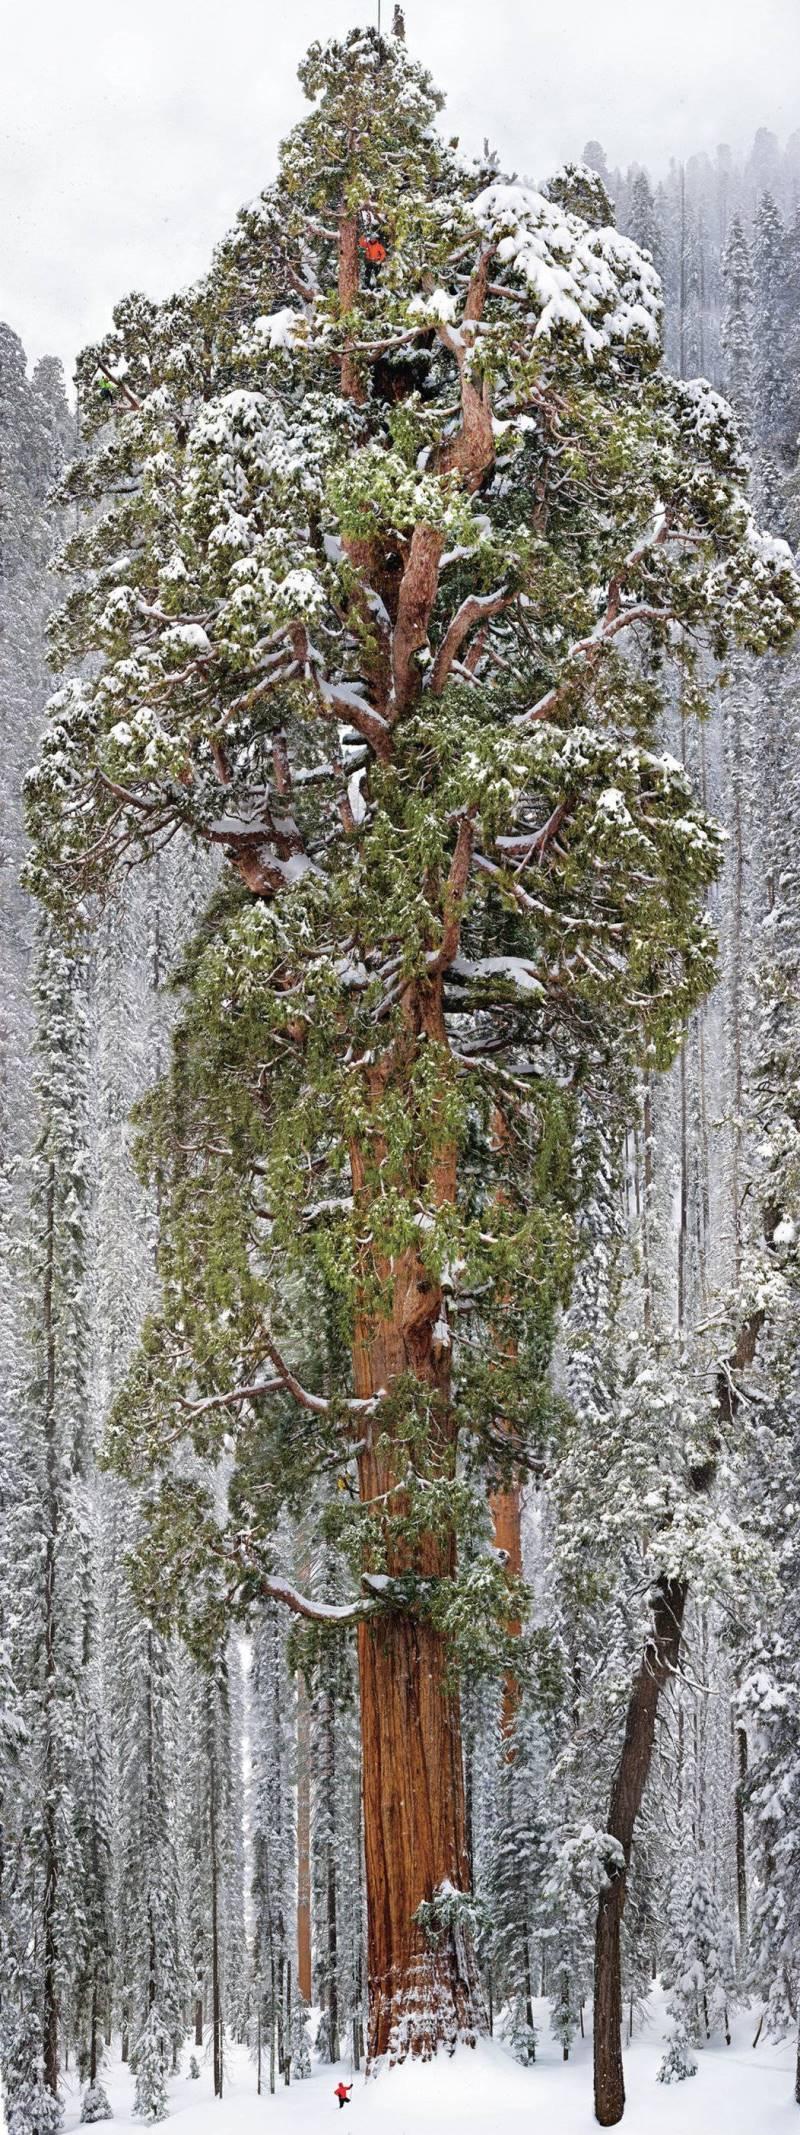 3200-year-old-tree-sequoia-national-park.jpg